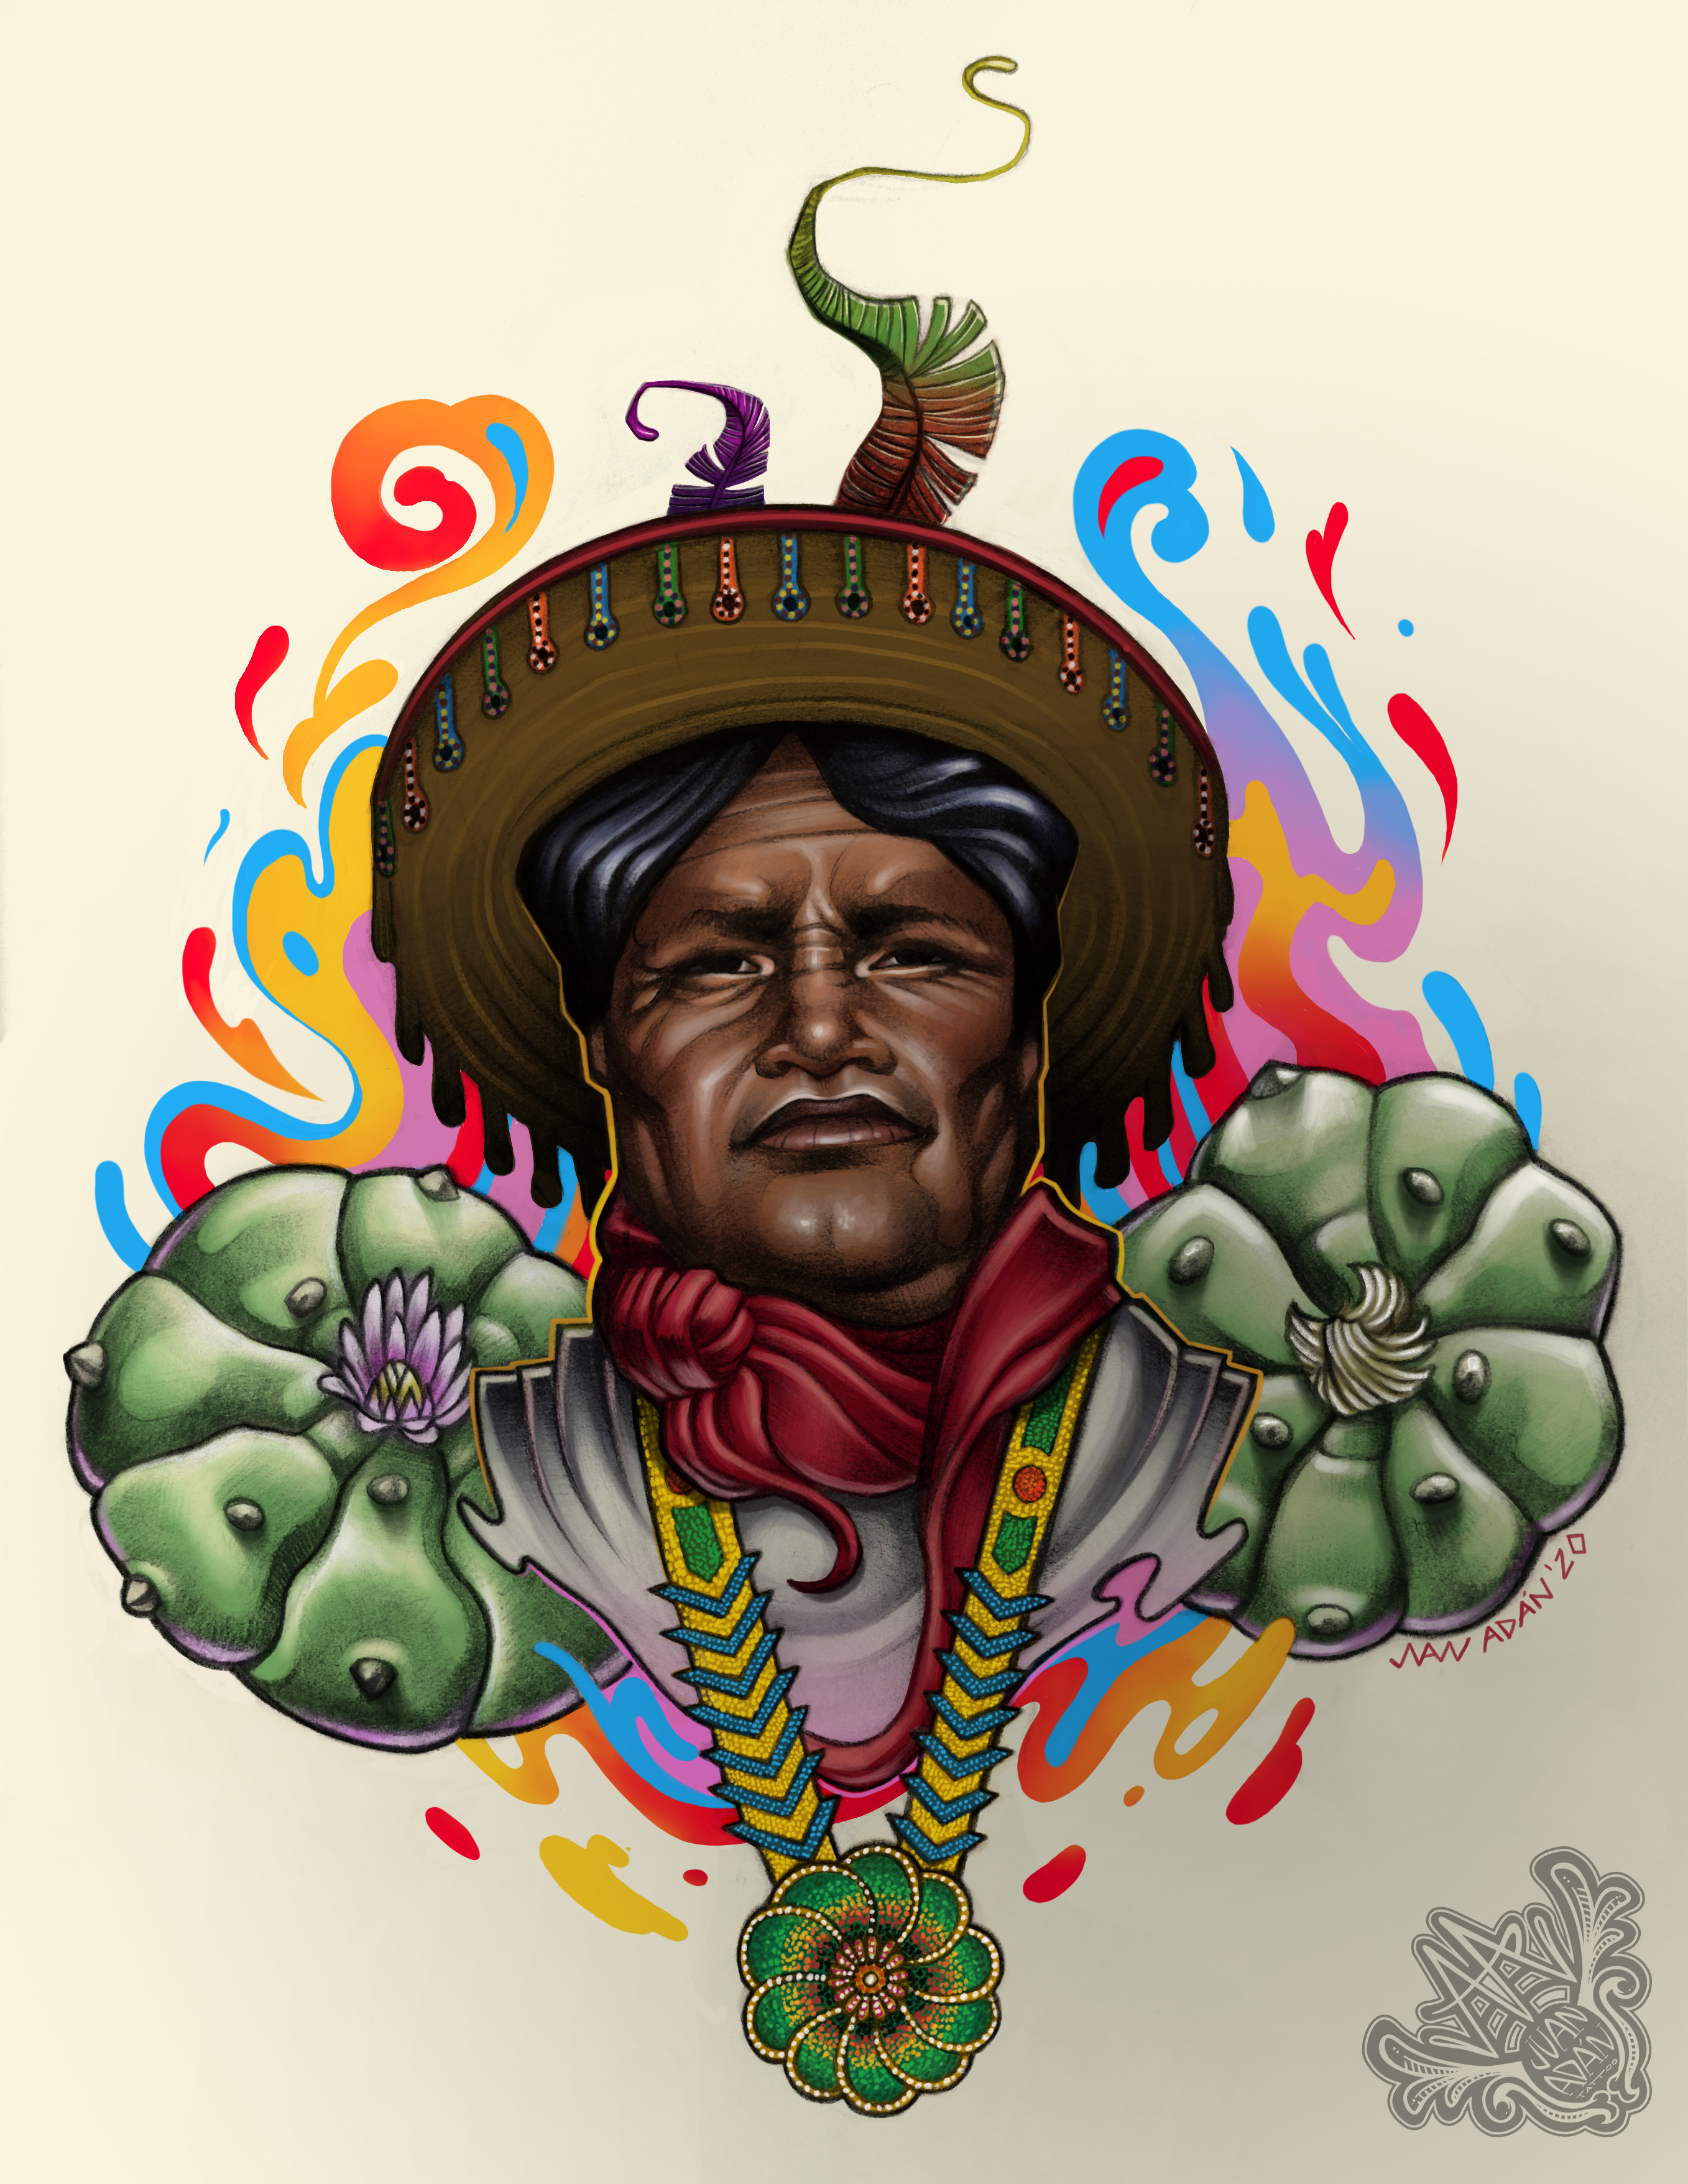 wixarica-huichol-ilustracion-mexico-prehispanico-artesaniahuichol-pueblohuichol-pueblowixarica-wixas